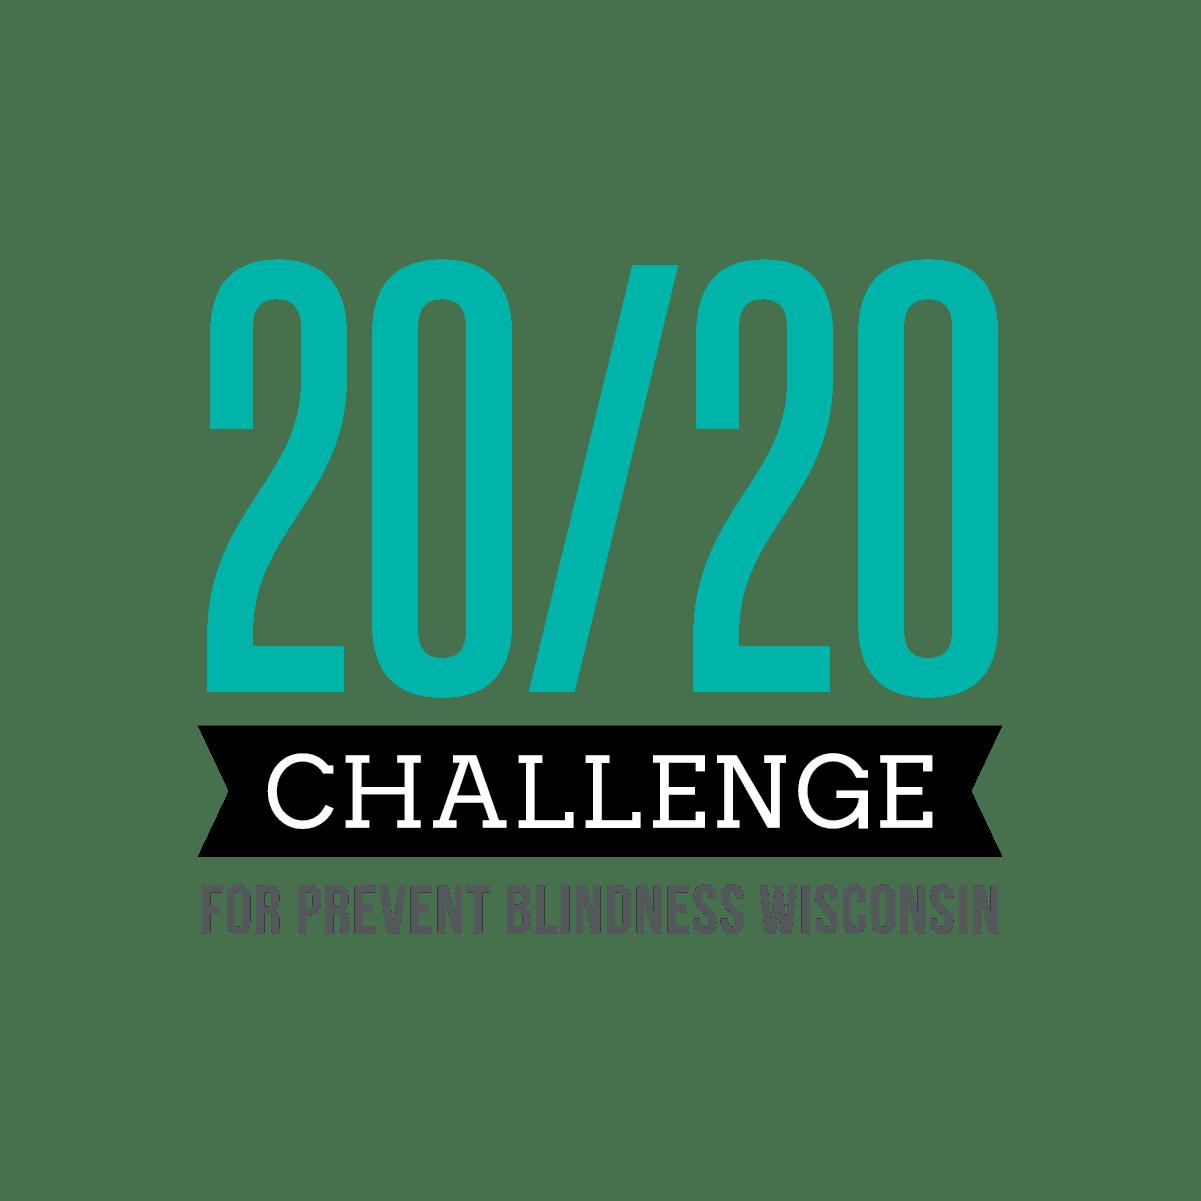 2020 Challenge Logo PNG